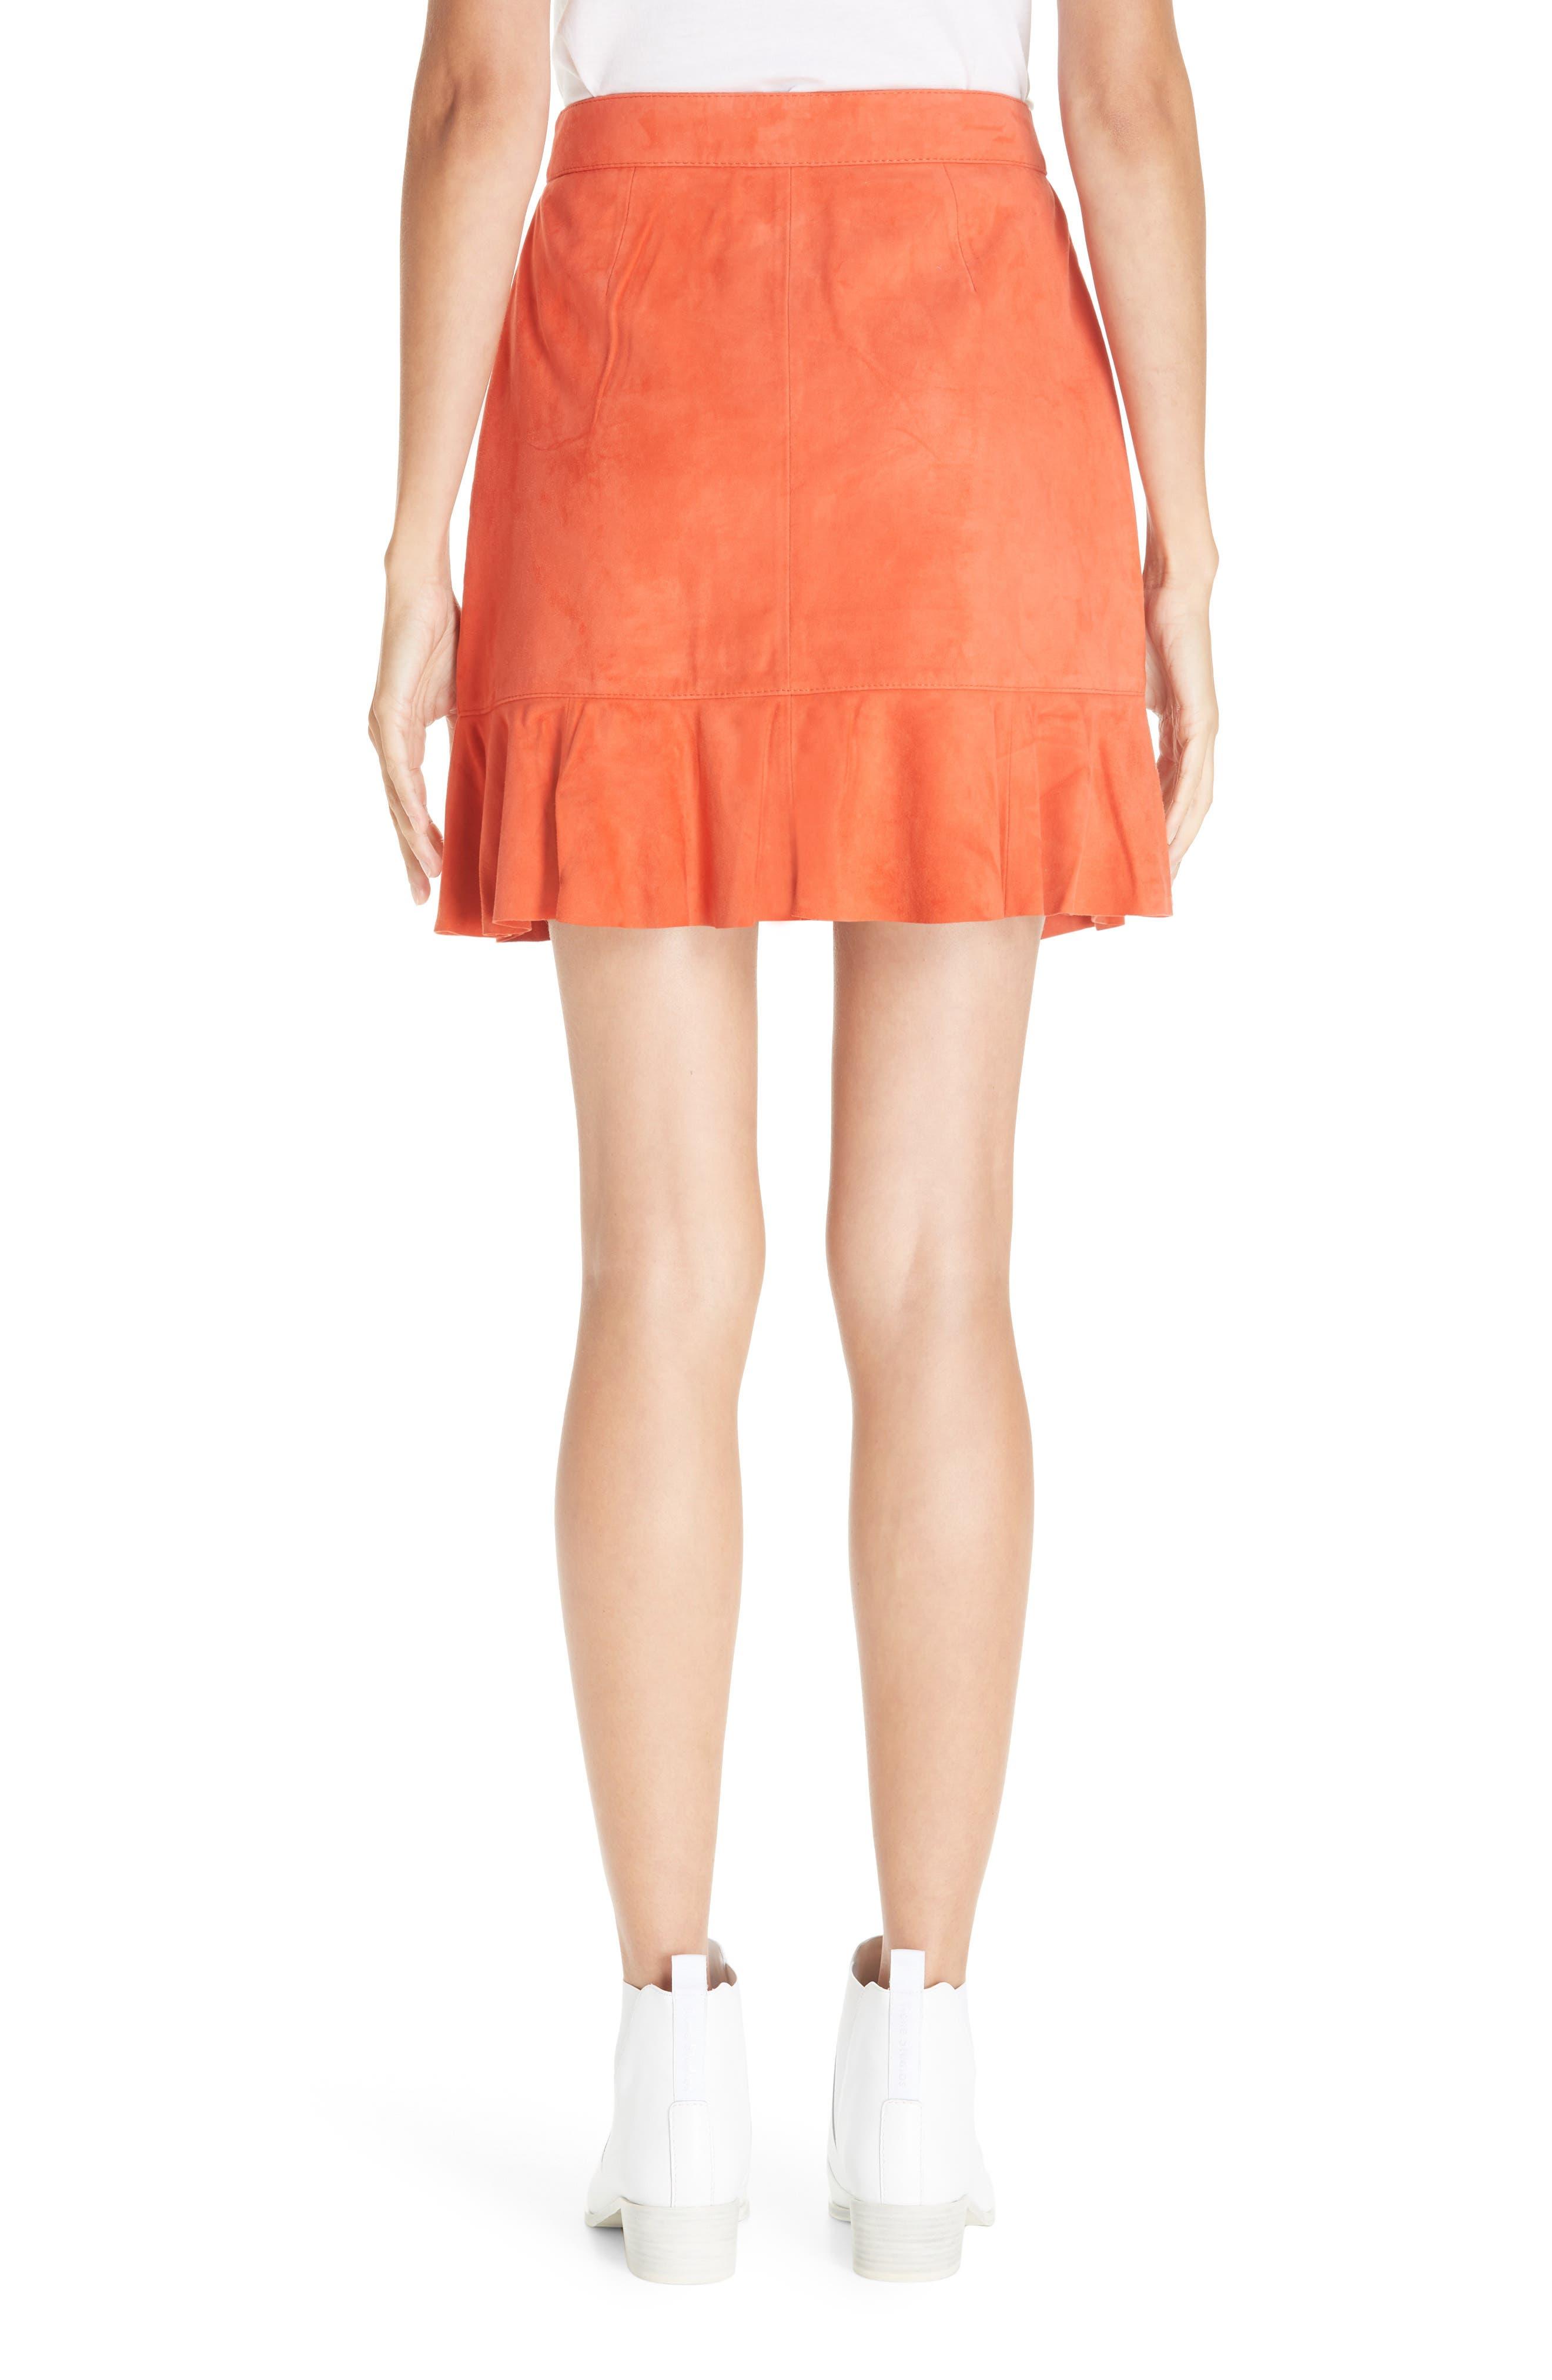 GANNI,                             Salvia Suede Skirt,                             Alternate thumbnail 2, color,                             800